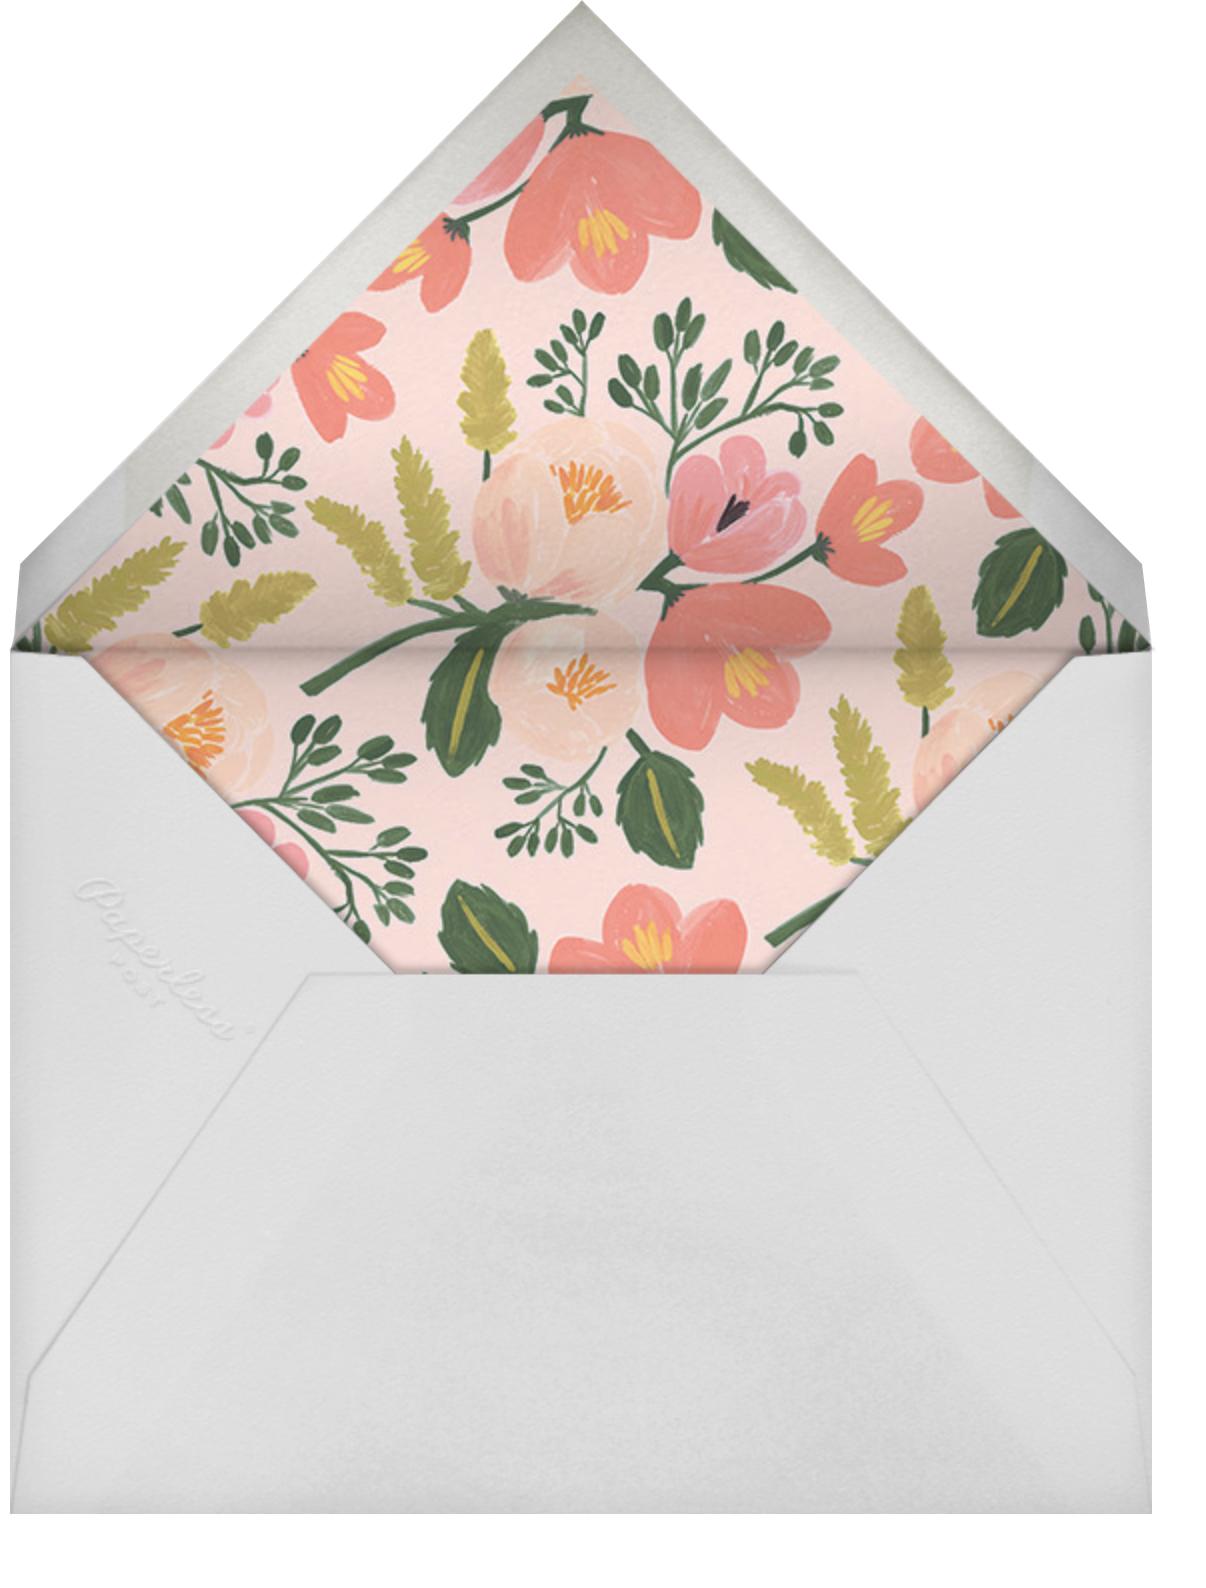 Botanic Year (Tall) - White - Rifle Paper Co. - New Year's Eve - envelope back